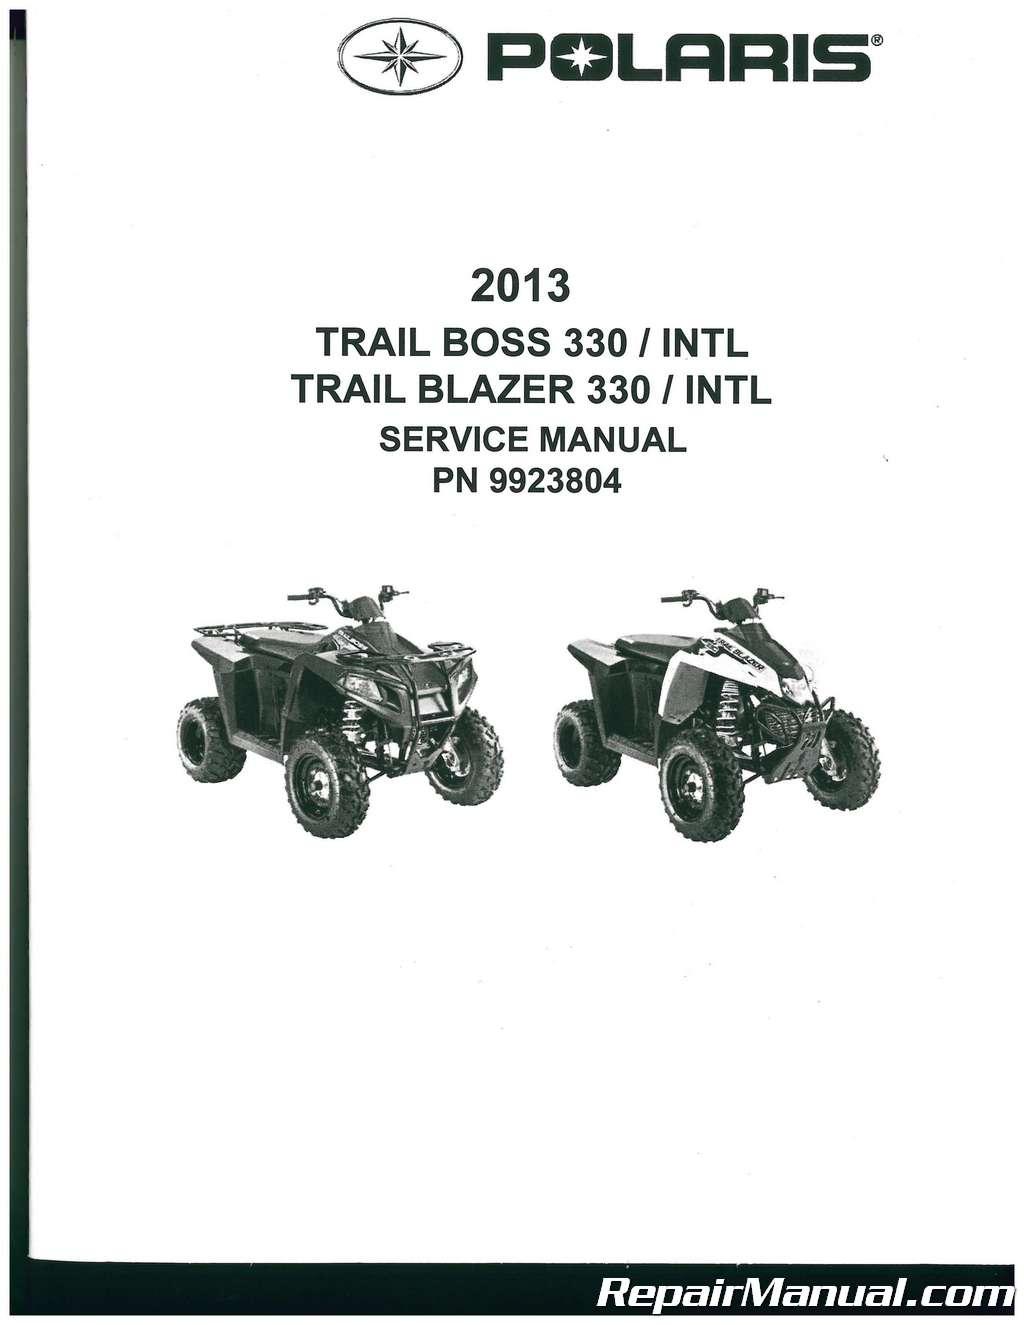 2013 Polaris Trail Boss 330 Trail Blazer 330 ATV Service